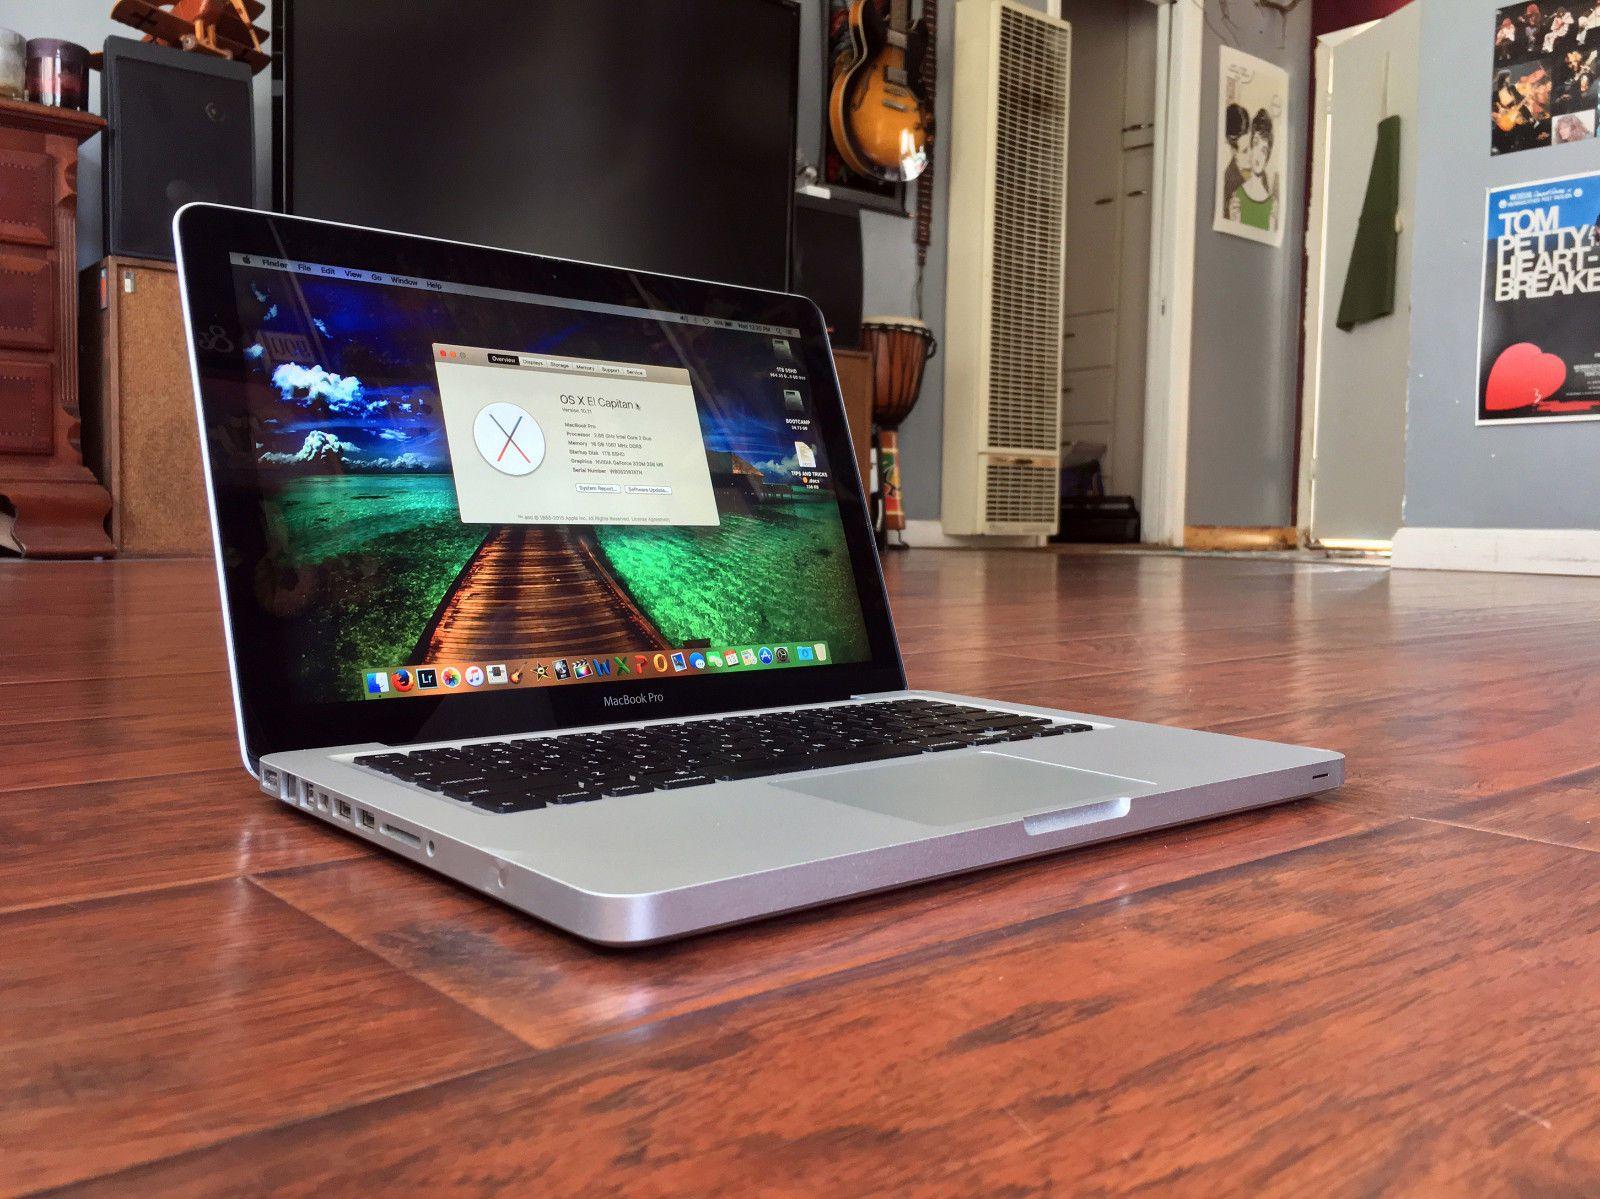 "CLEAN Apple MacBook Pro 13"" Laptop 2.66GHz/16GB/1TB SSHD El Capitan"